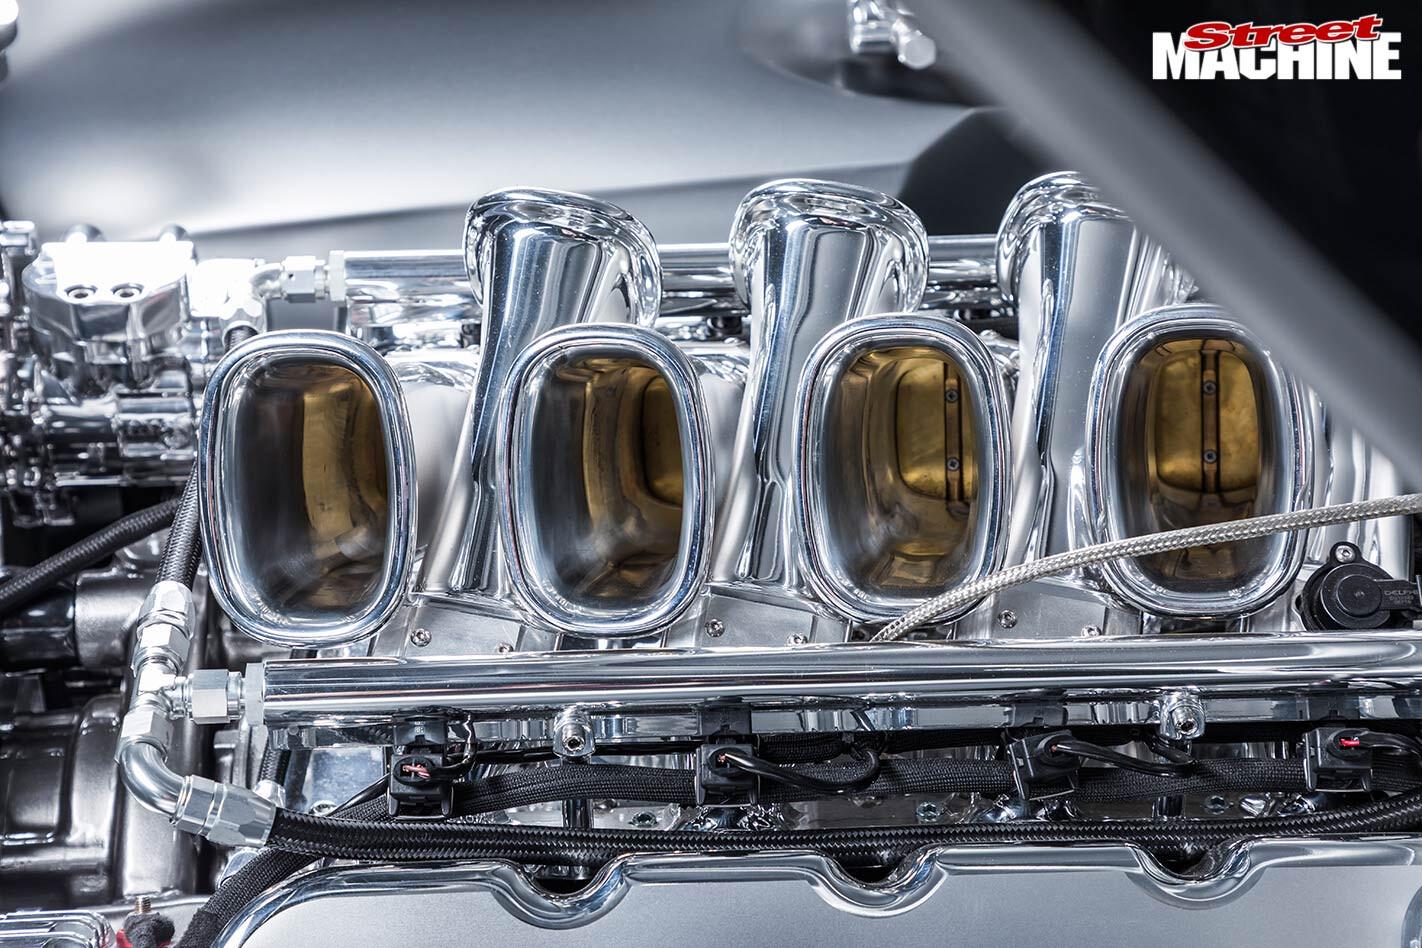 Holden EH engine